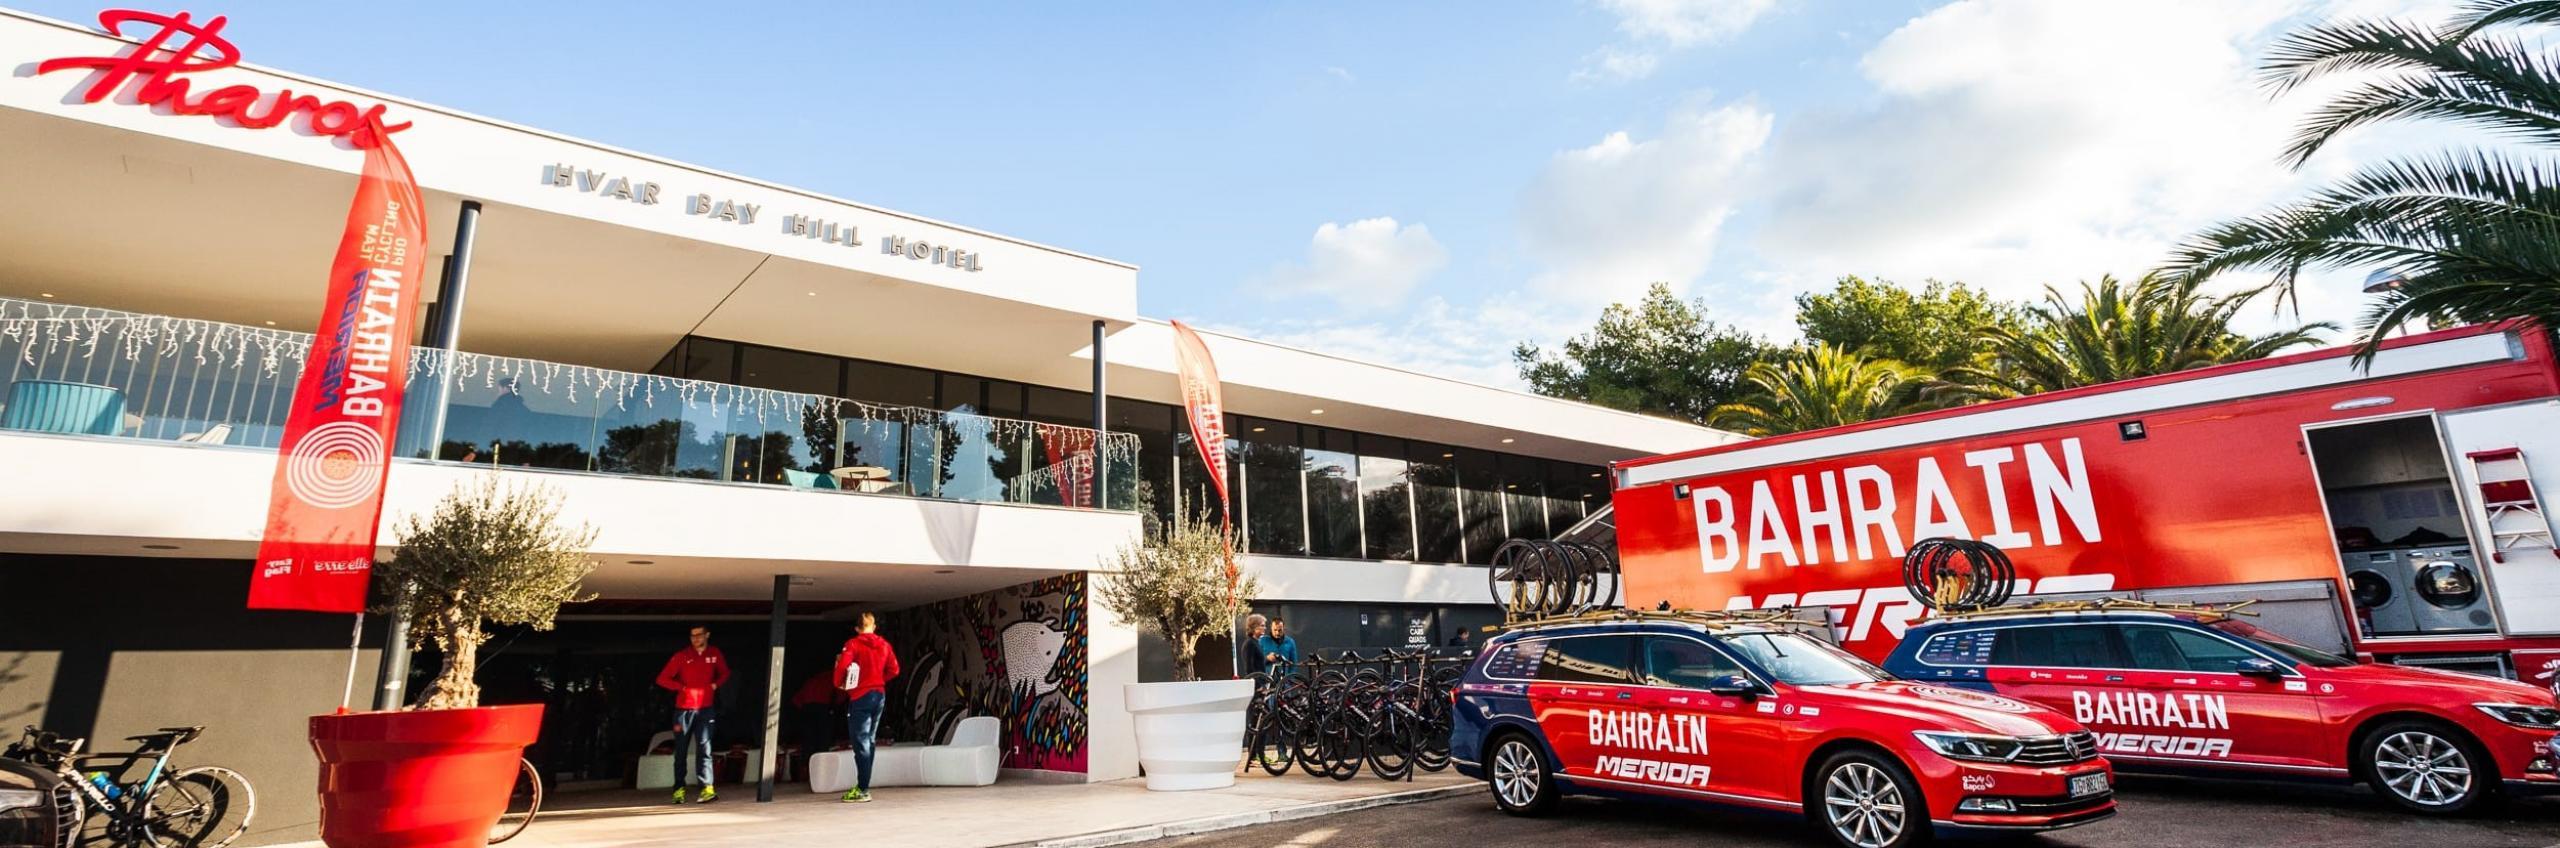 Suncani Hvar Hotels